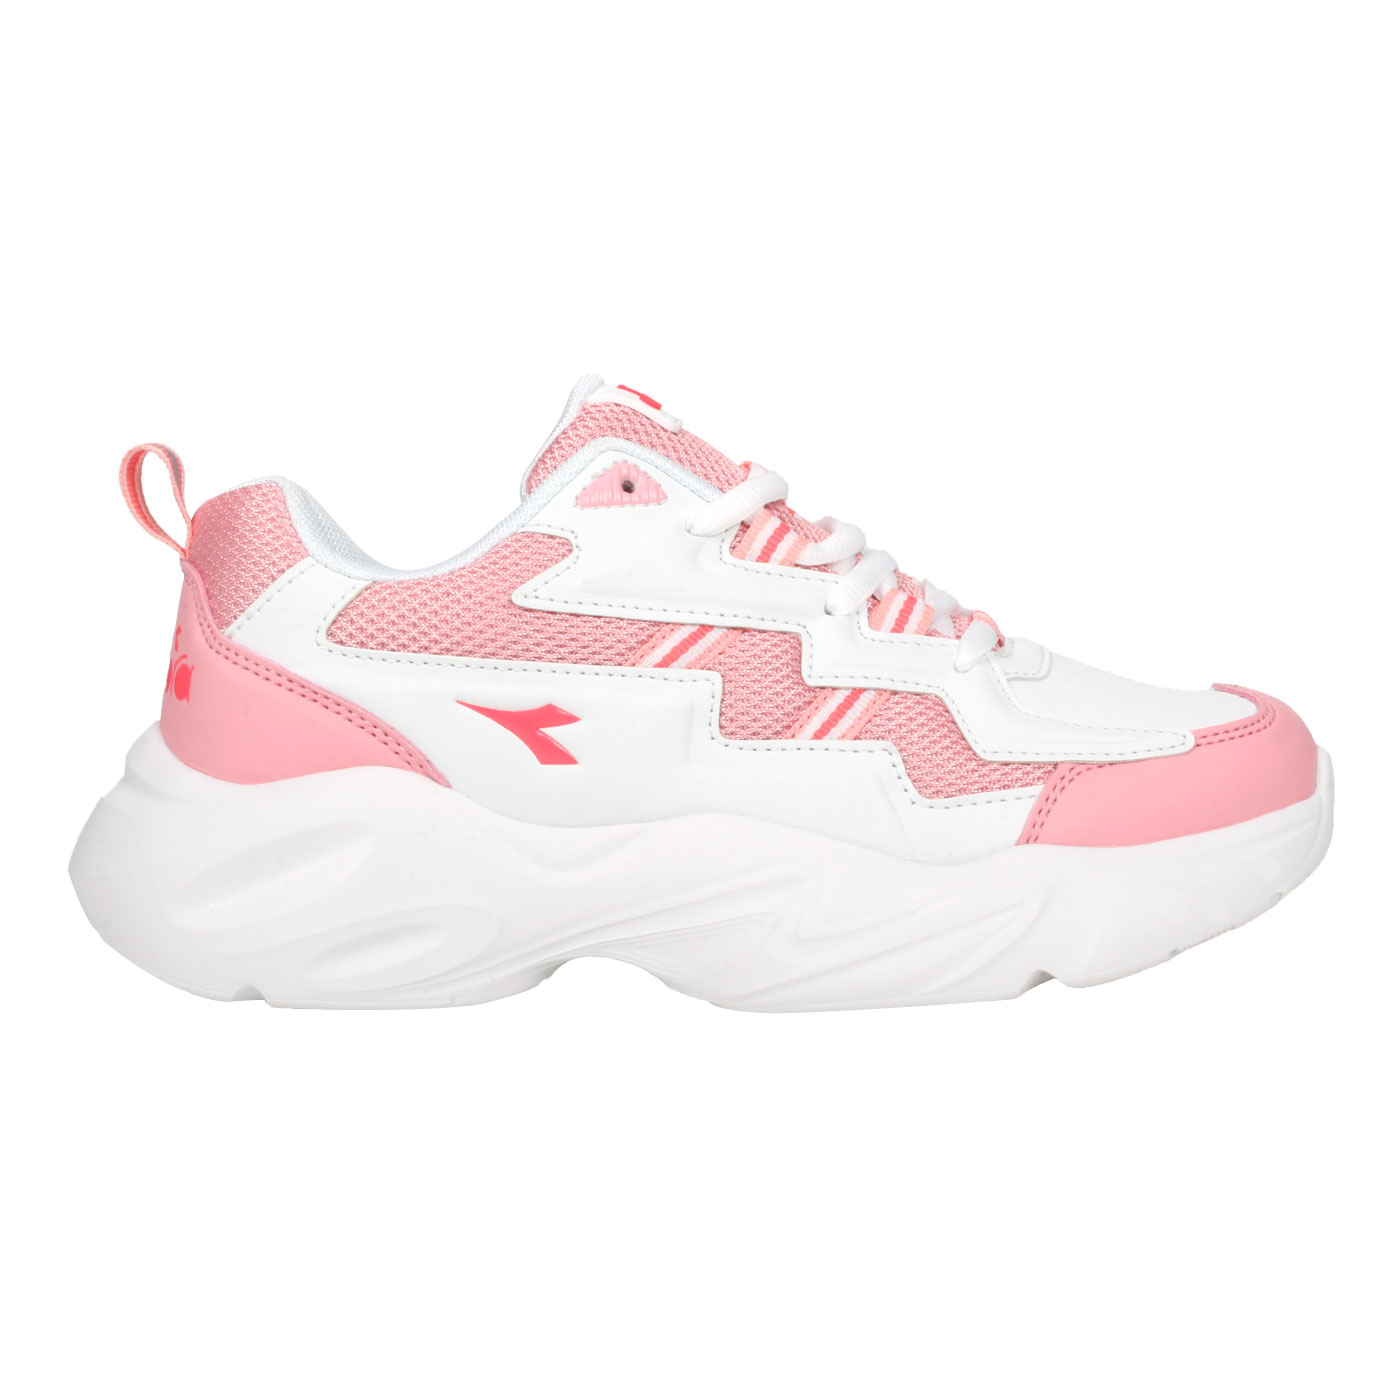 DIADORA 女款休閒運動鞋 DA31656 - 粉紅白